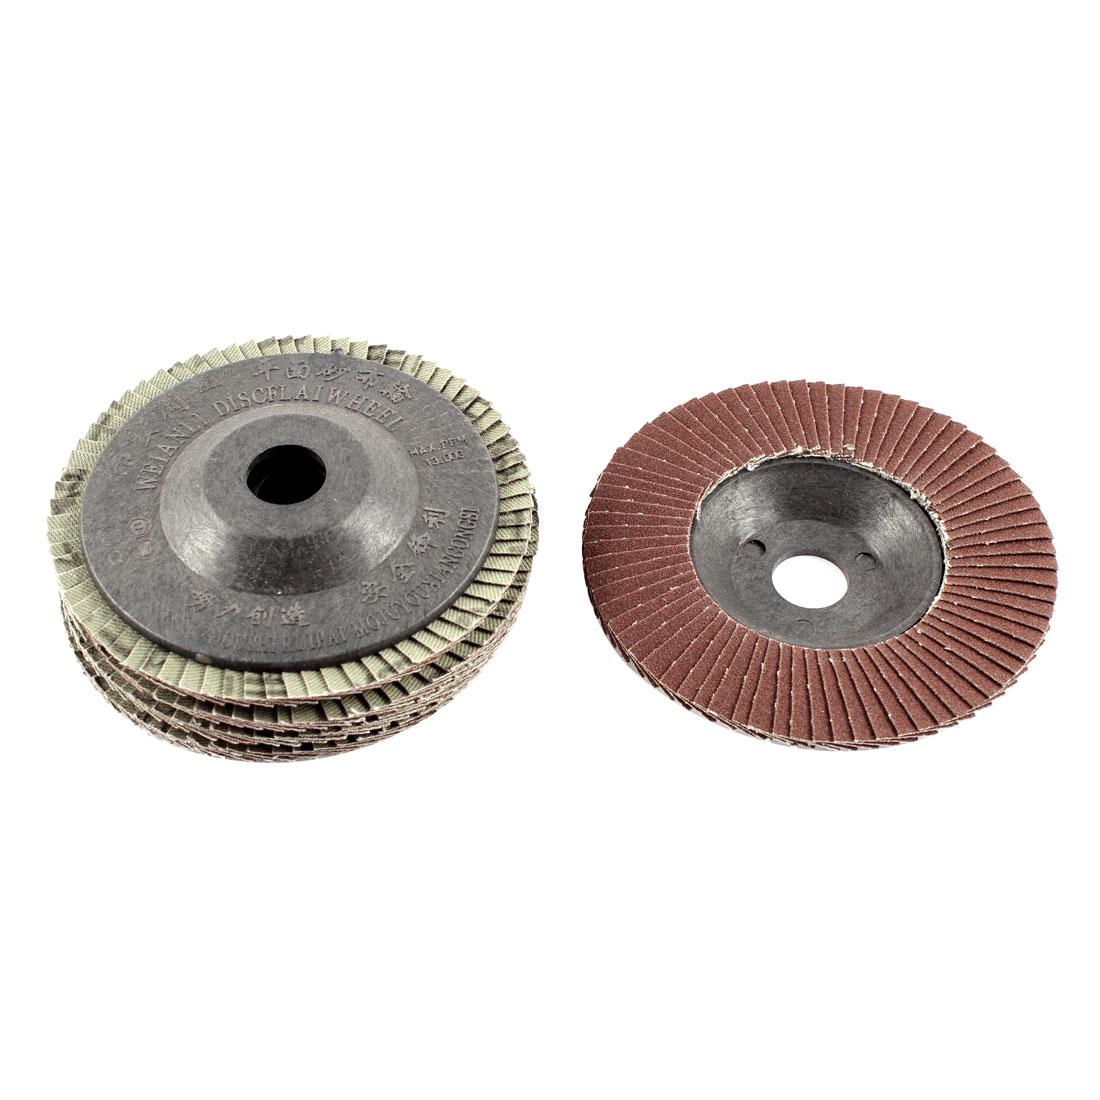 "5pcs 4"" x 5/8"" Zirconium Oxide Flap Sanding Discs Polish Grinding Wheel 120 Grit"